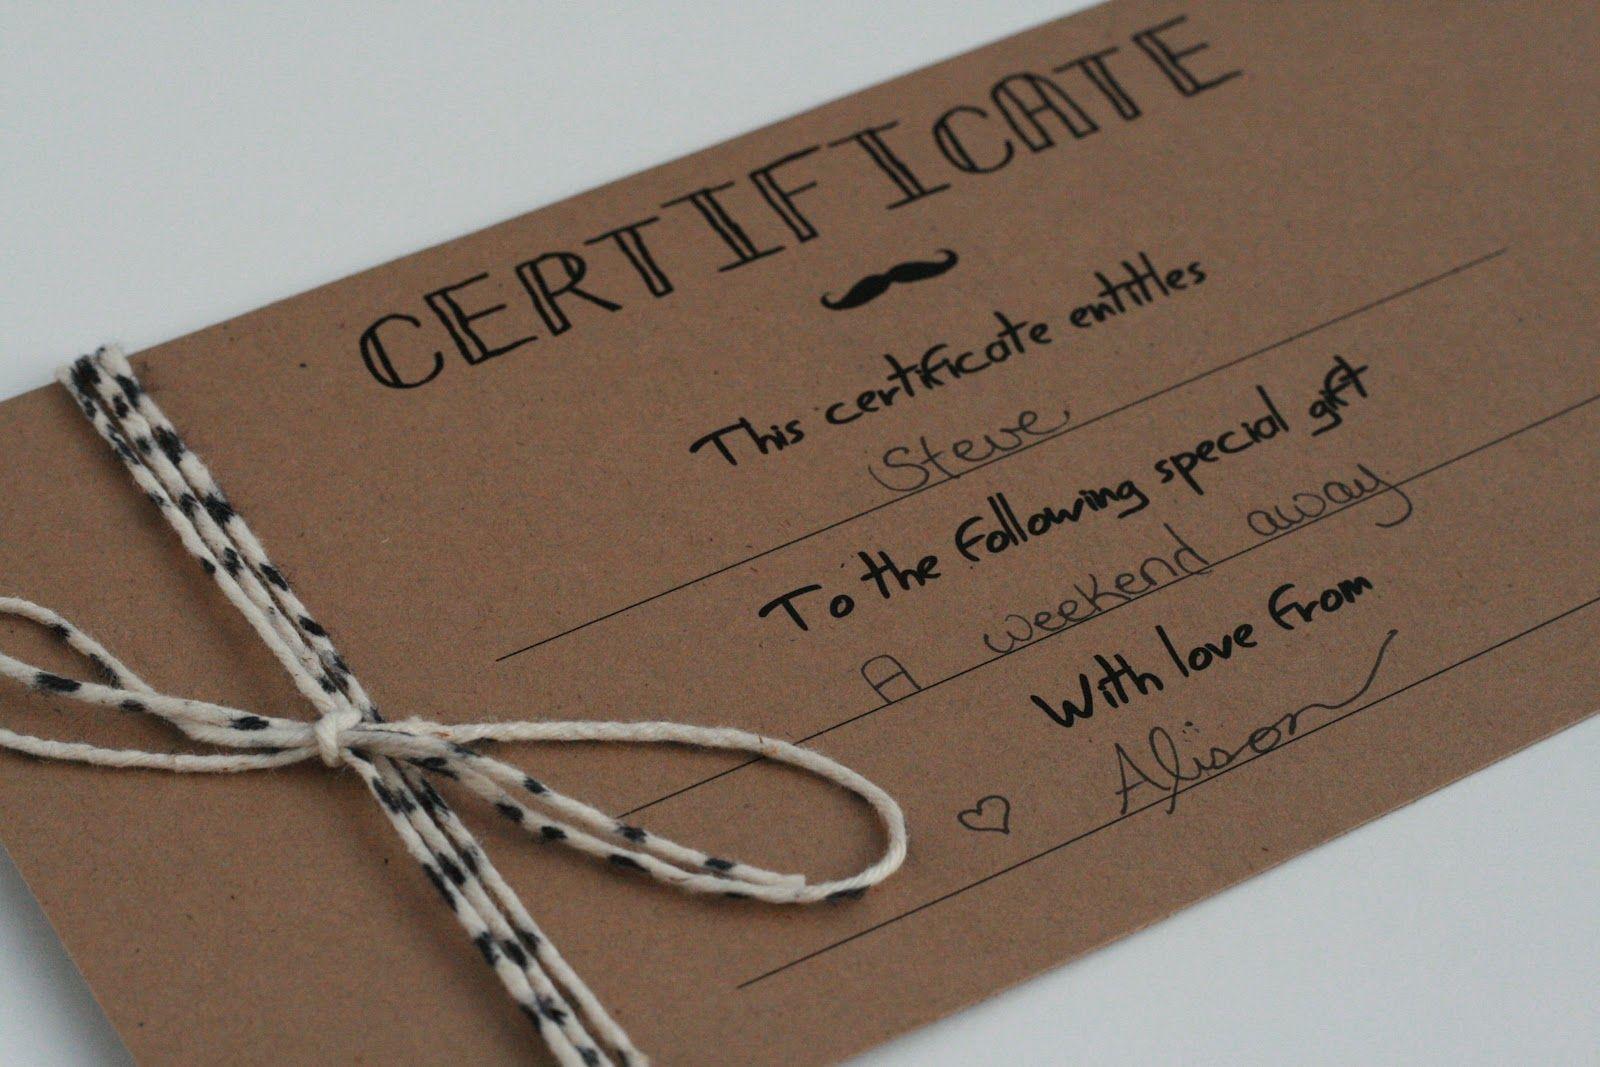 free gift certificate templates hippest download. Black Bedroom Furniture Sets. Home Design Ideas